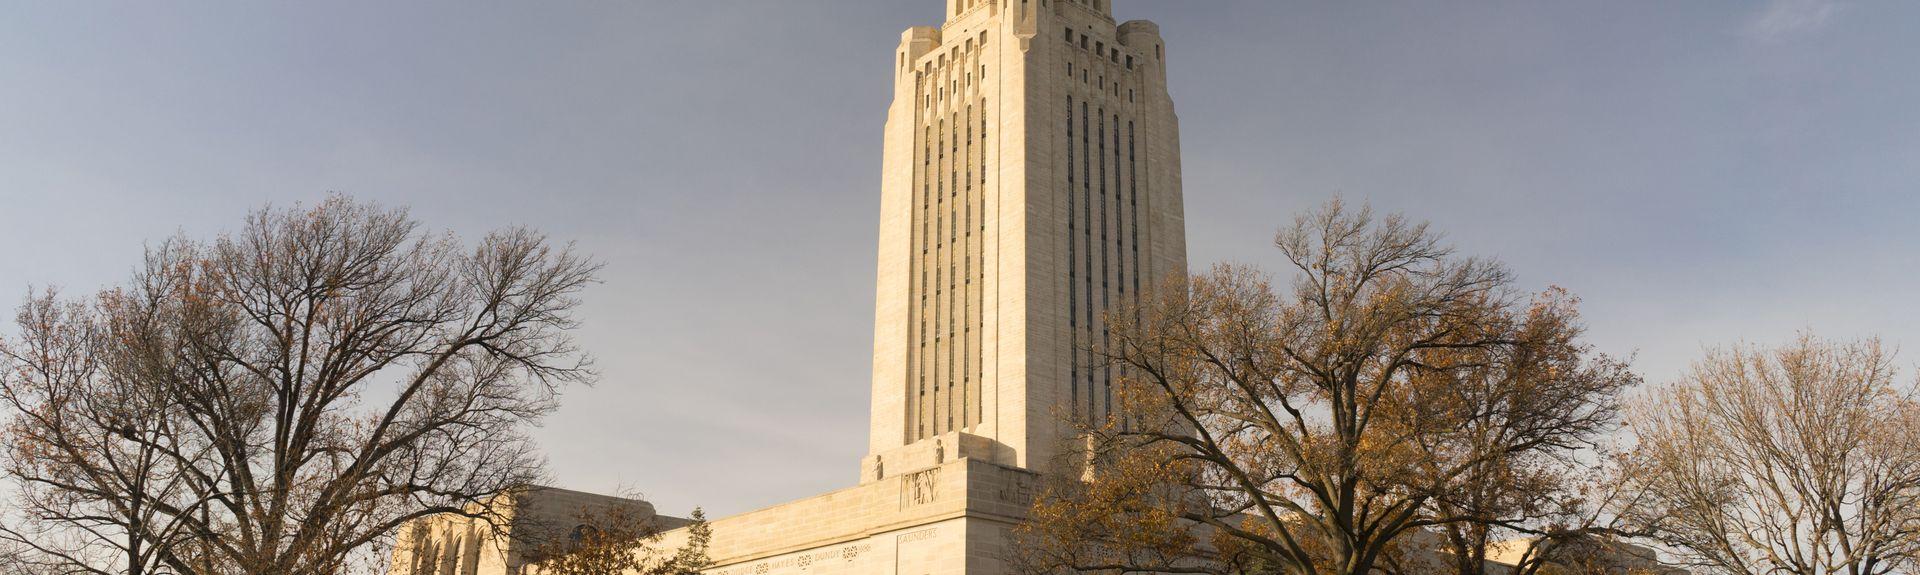 Lincoln, Nebraska, United States of America